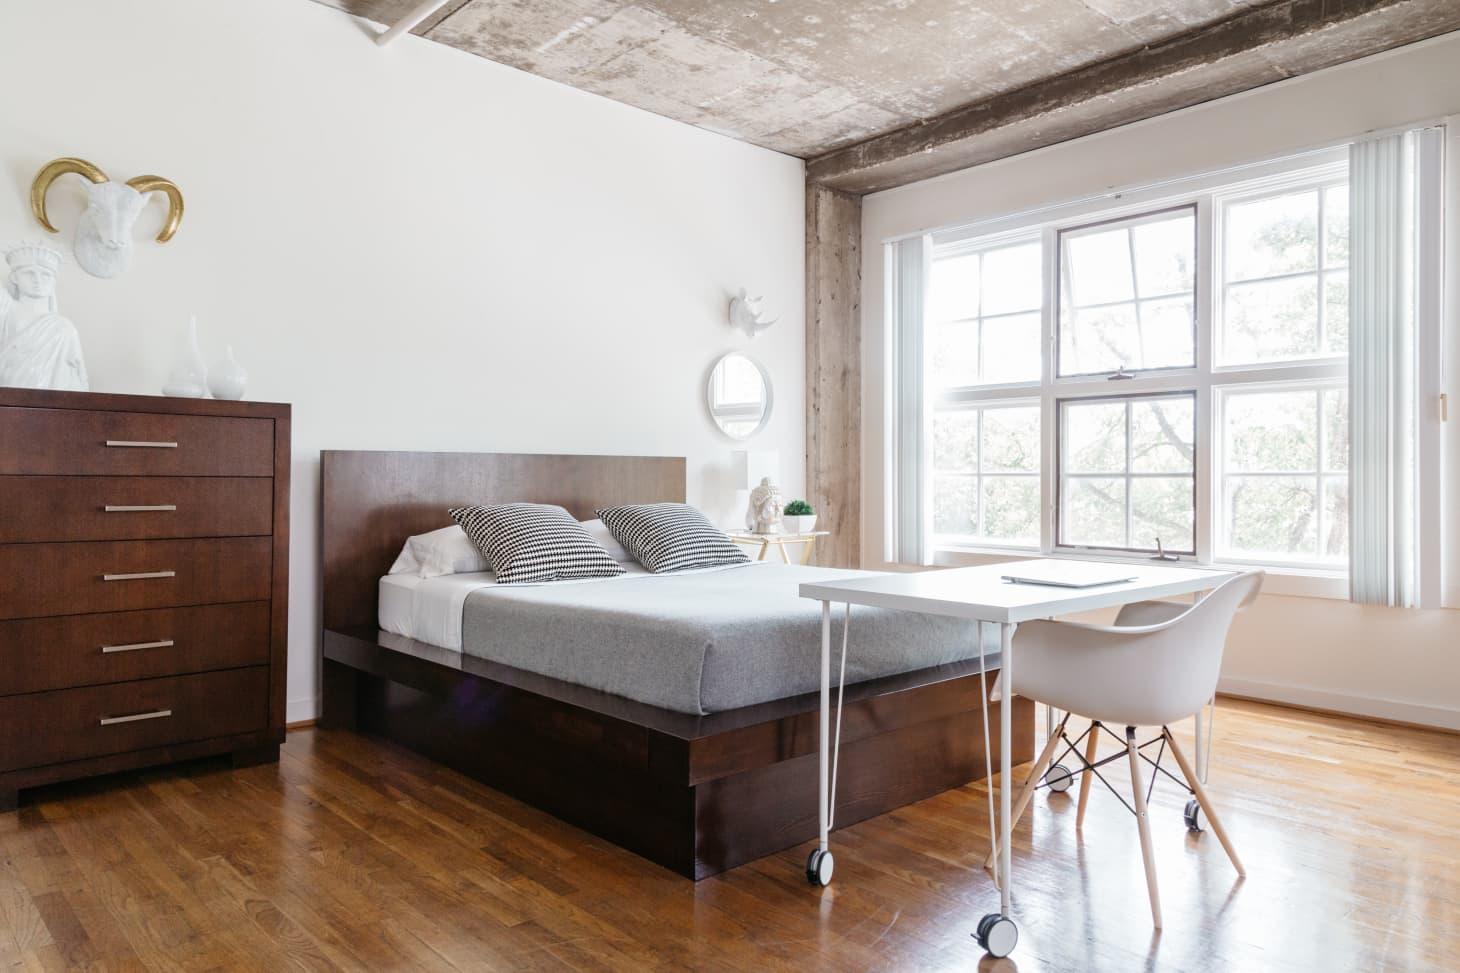 Inspirasi desain kamar minimalis - source: apartmenttherapy.com